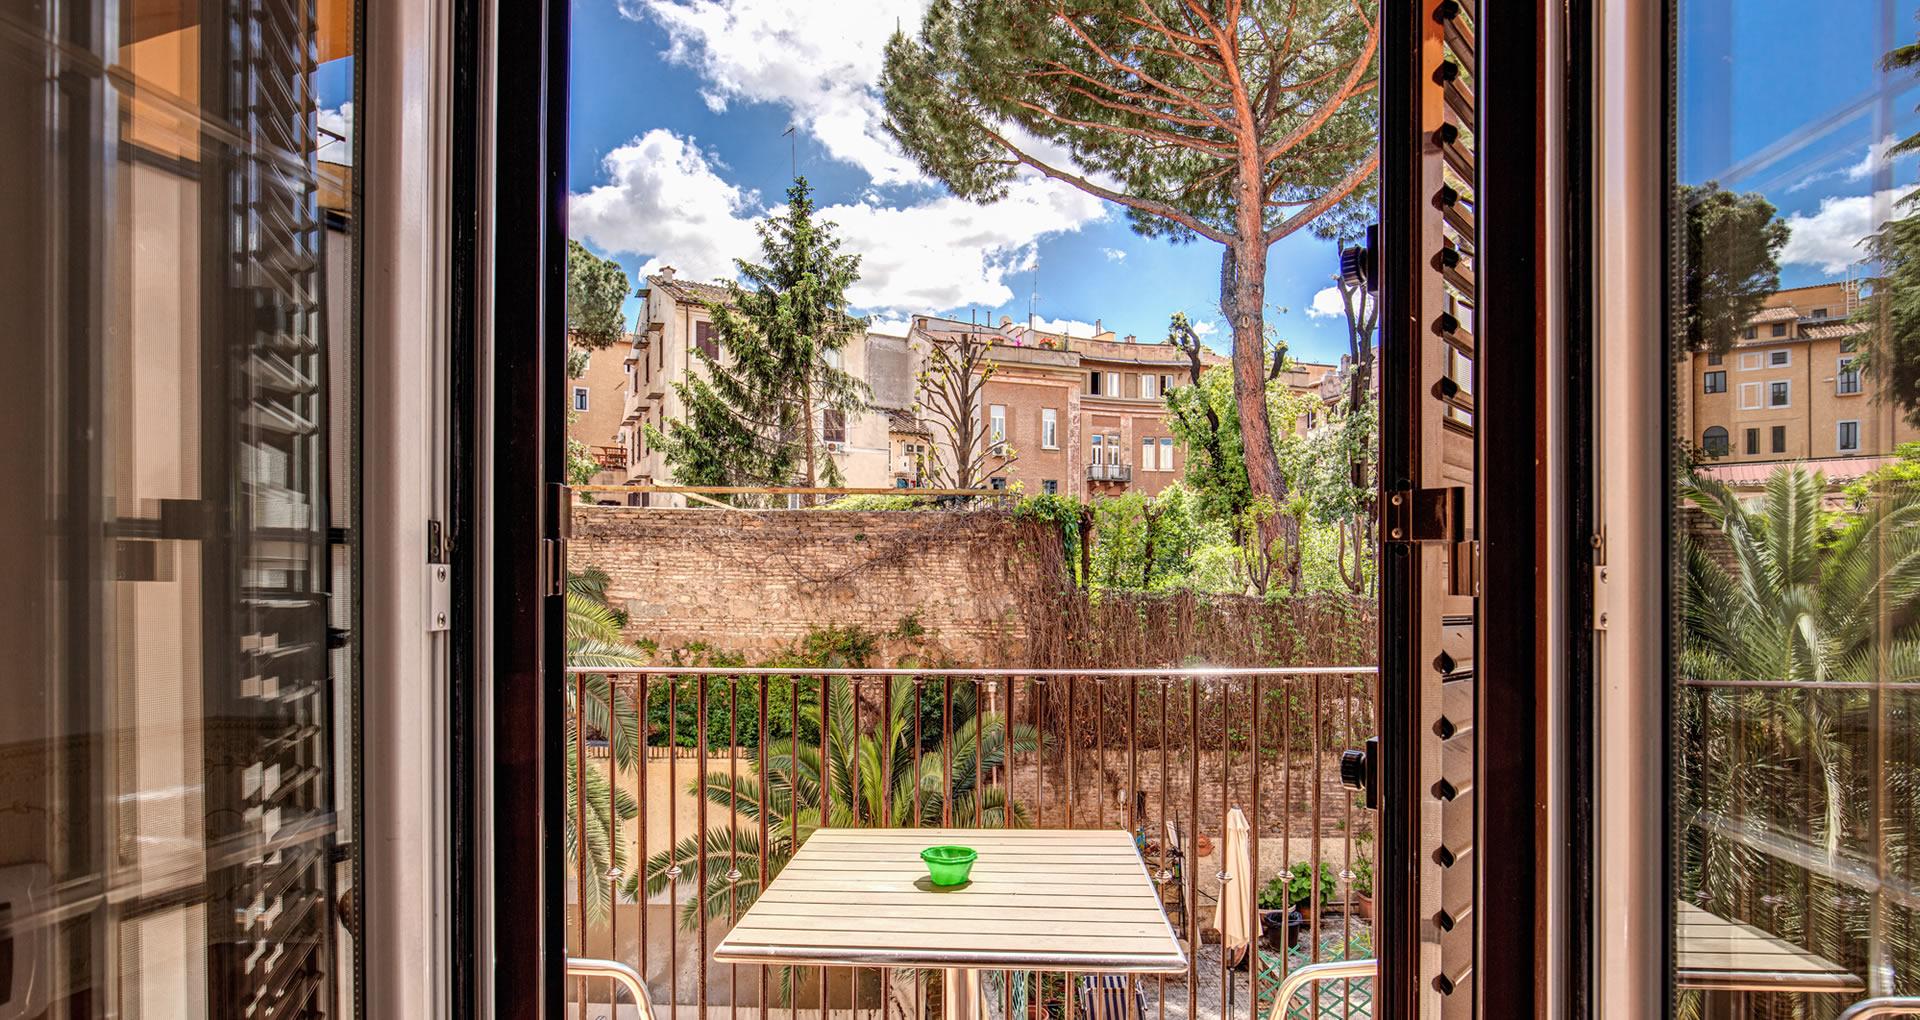 Hotel Near Termini Station And Colosseum Hotel Verona Rome